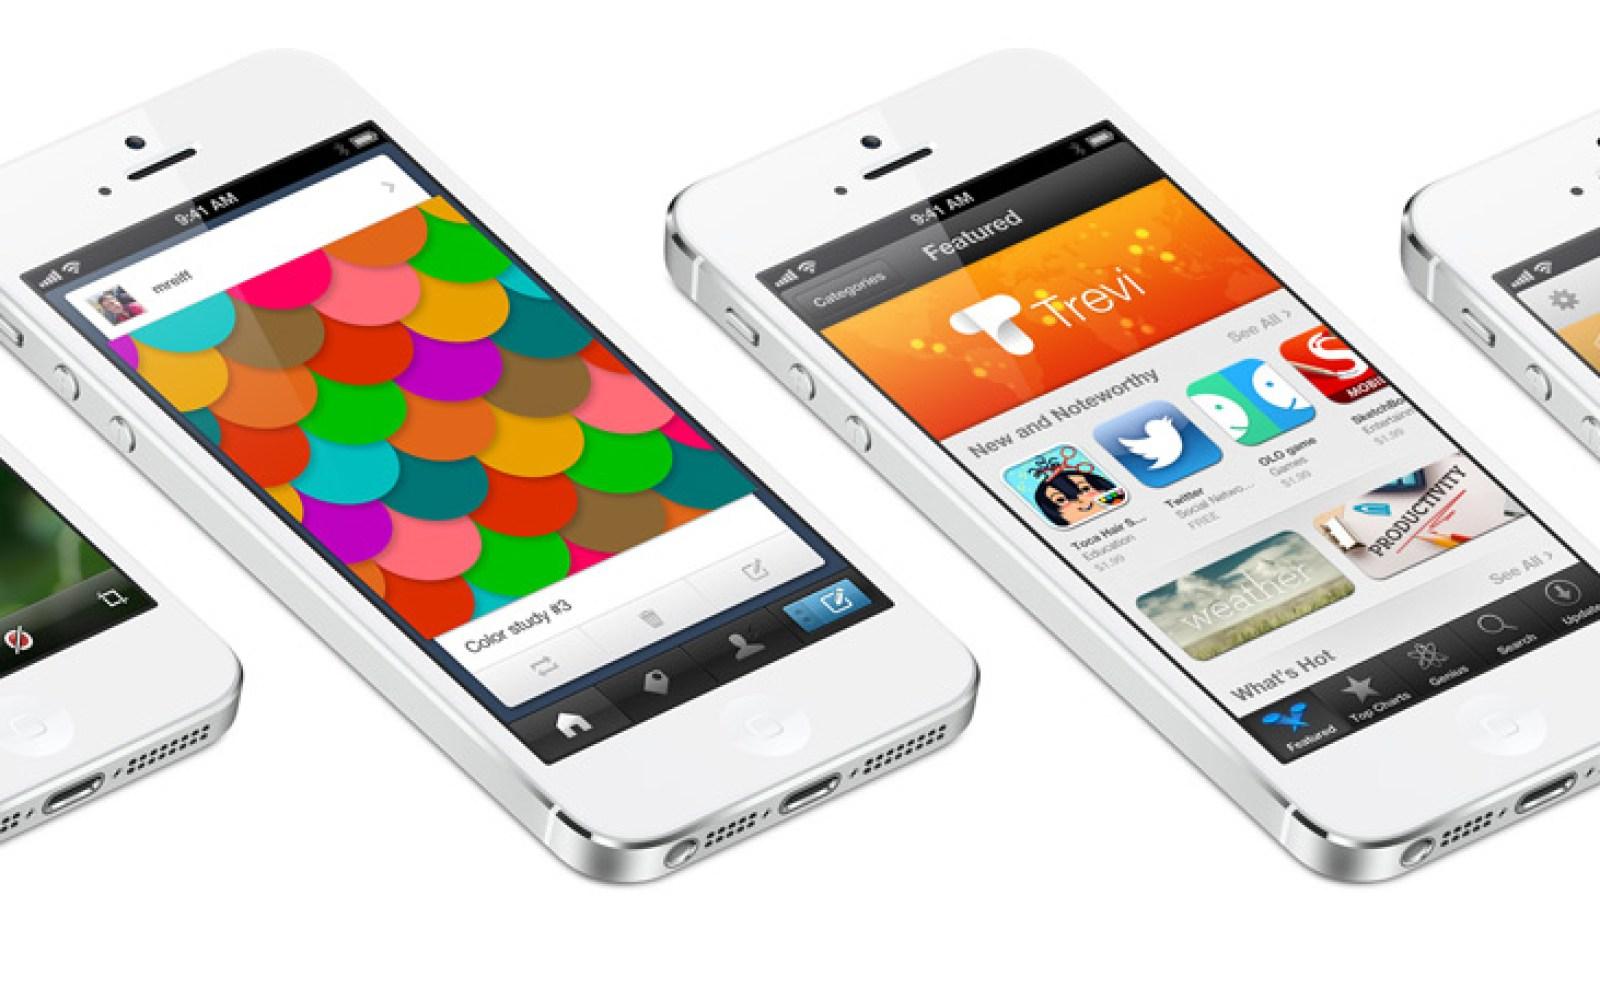 55 percent of Verizon's first-quarter smartphone sales (4M of 7.2M total) were iPhones